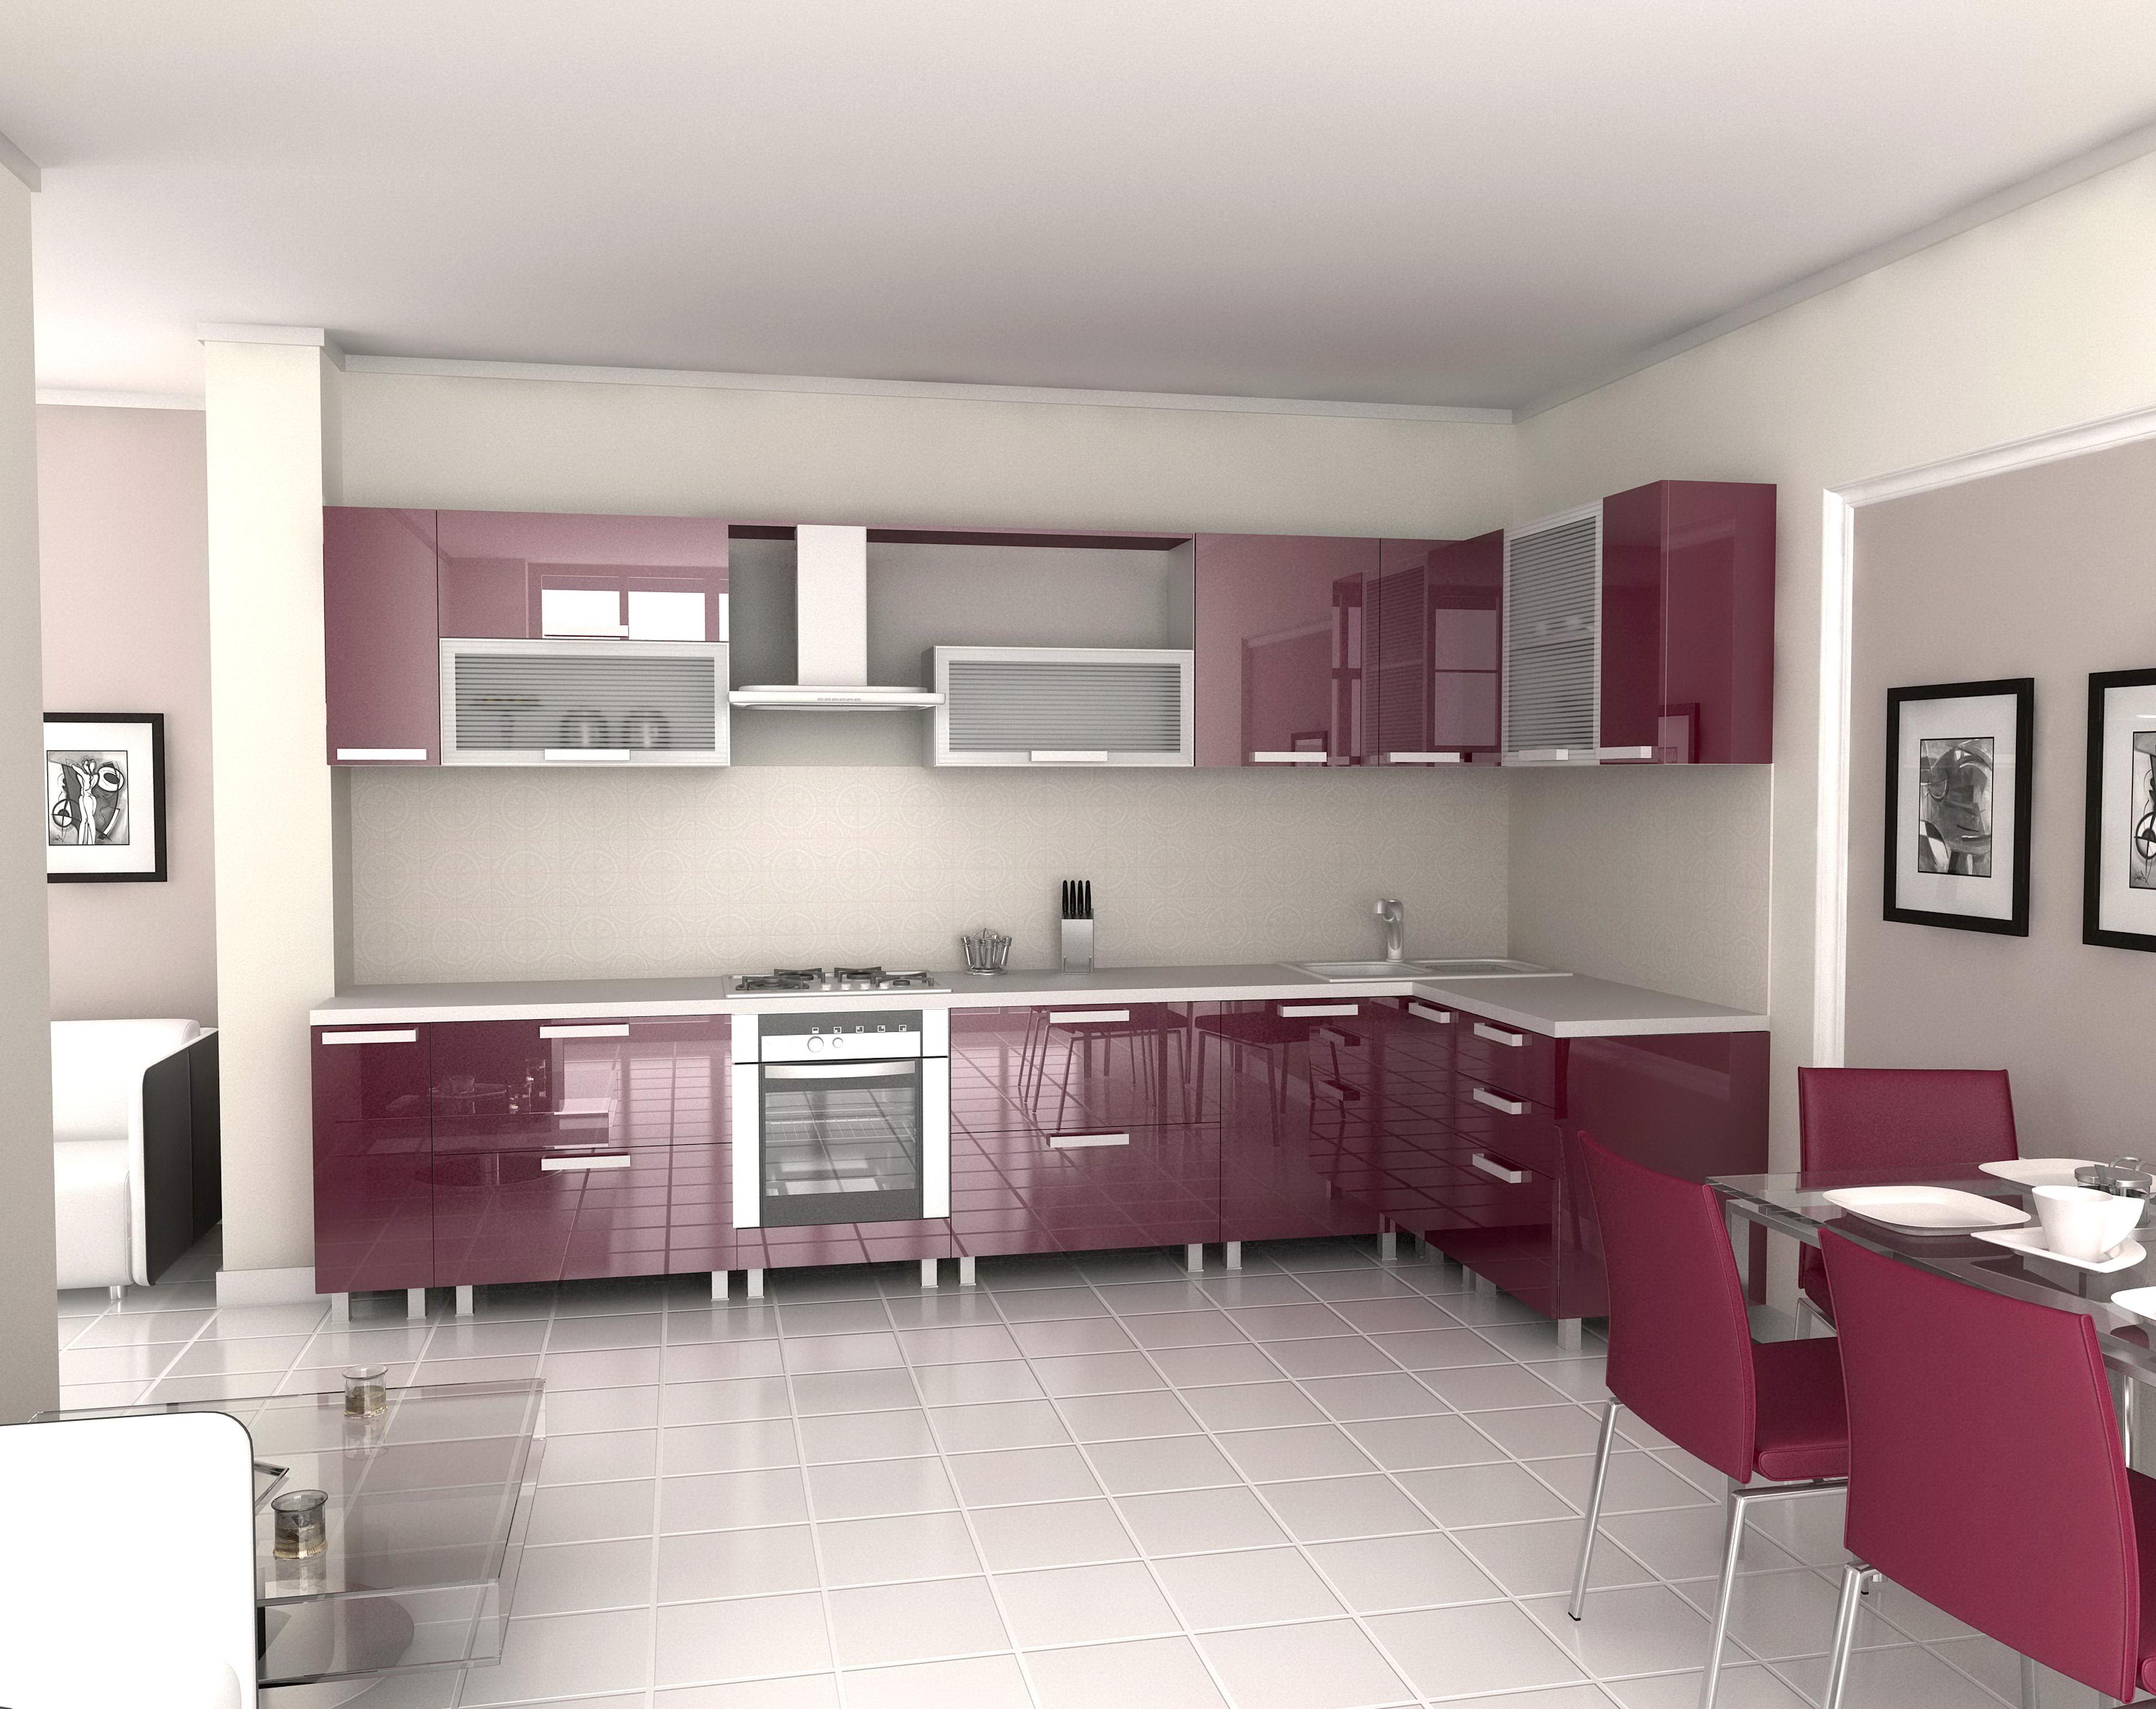 Vintage kitchen sets photo - 2